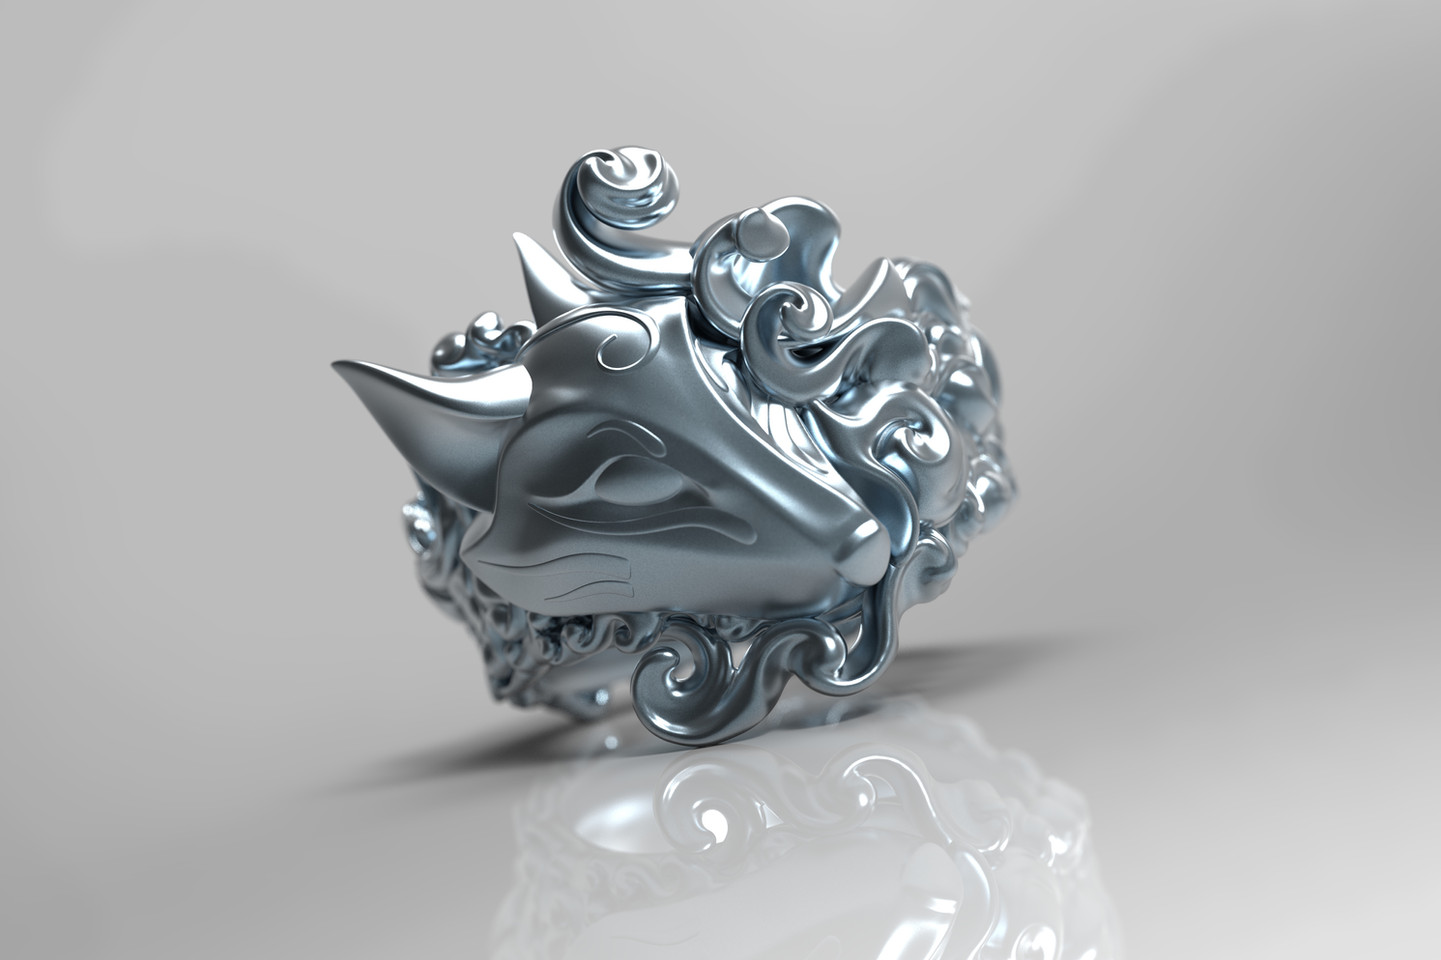 'Kitsune' Ring Design